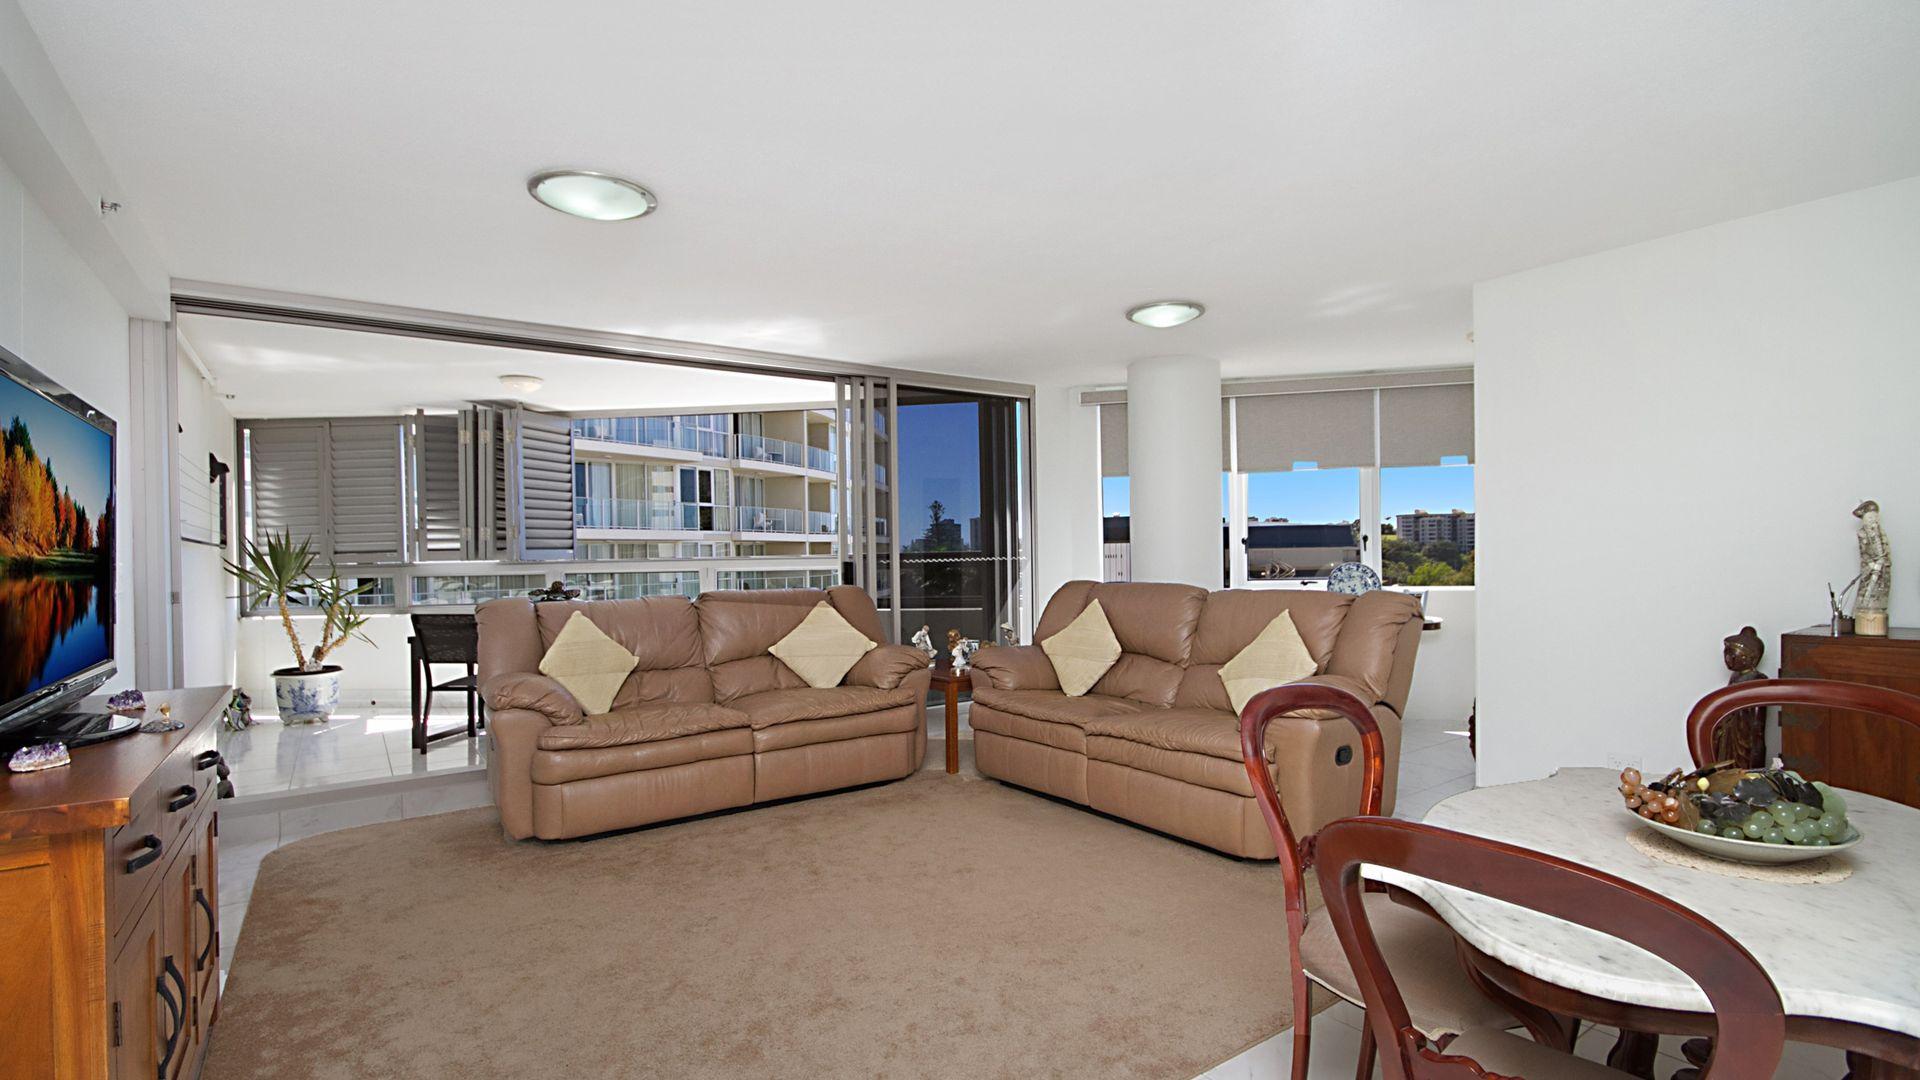 2052/20 Stuart Street - Tweed Ultima, Tweed Heads NSW 2485, Image 2